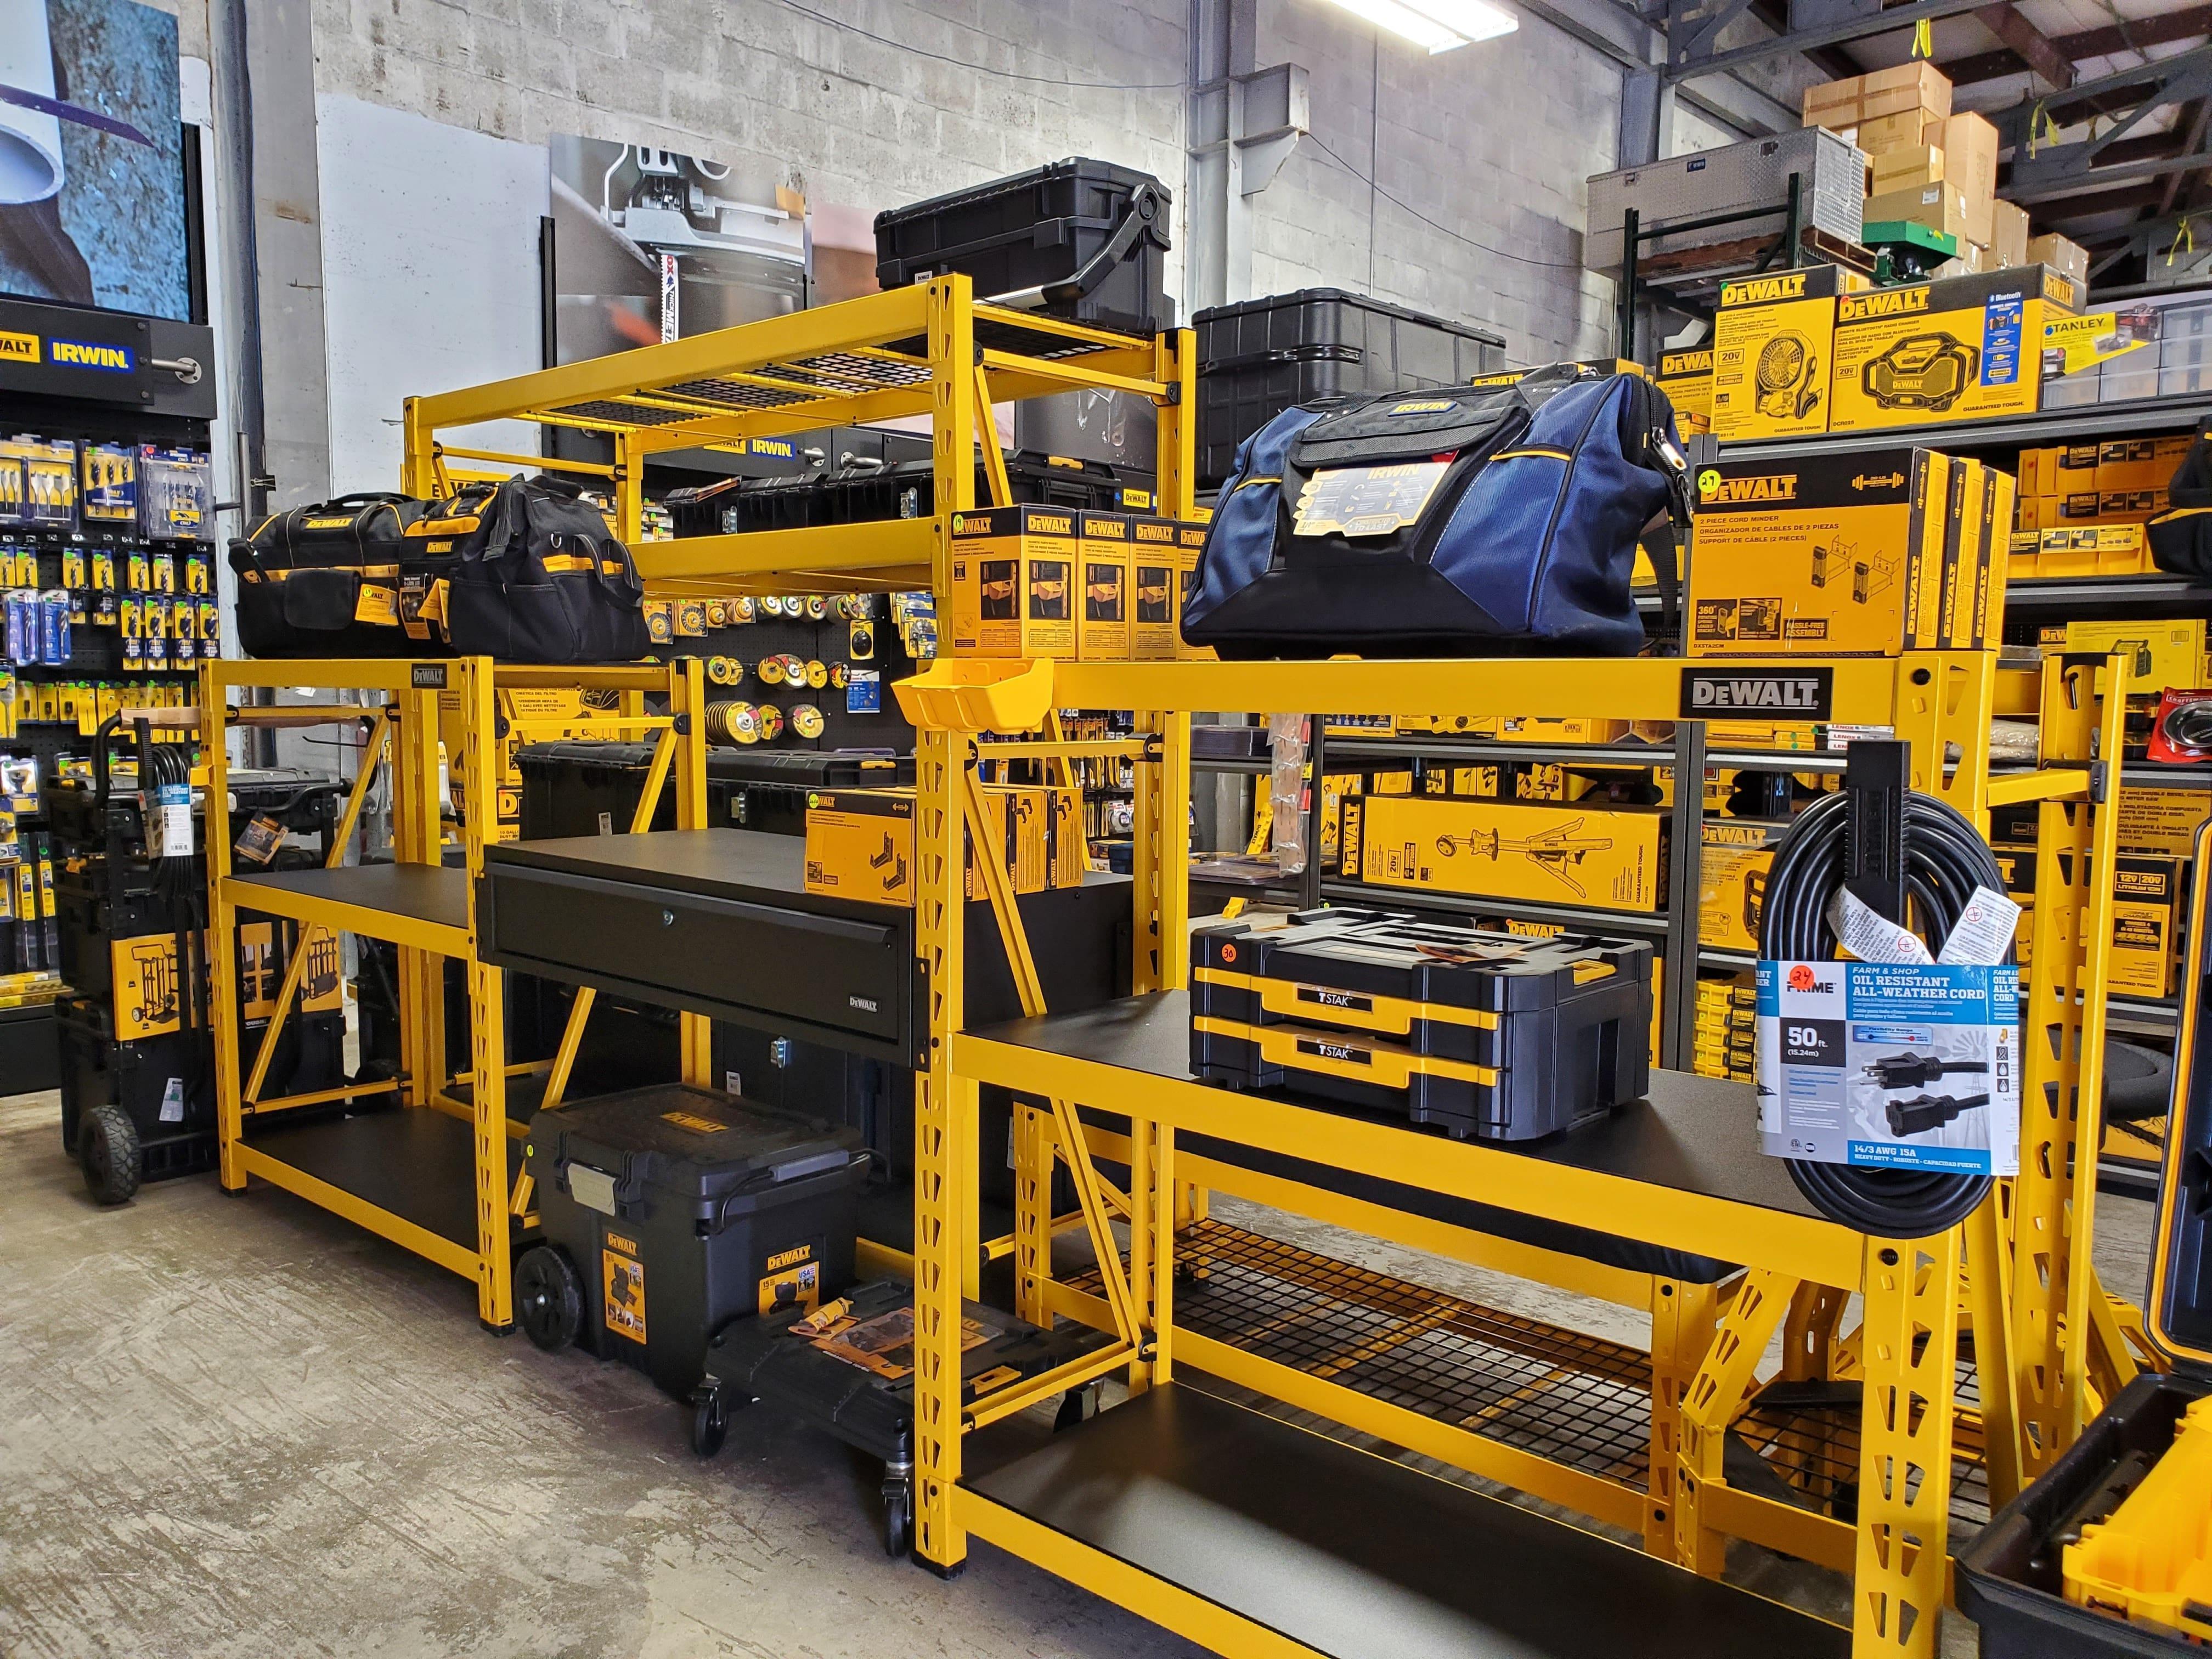 DeWalt Shelving Unit